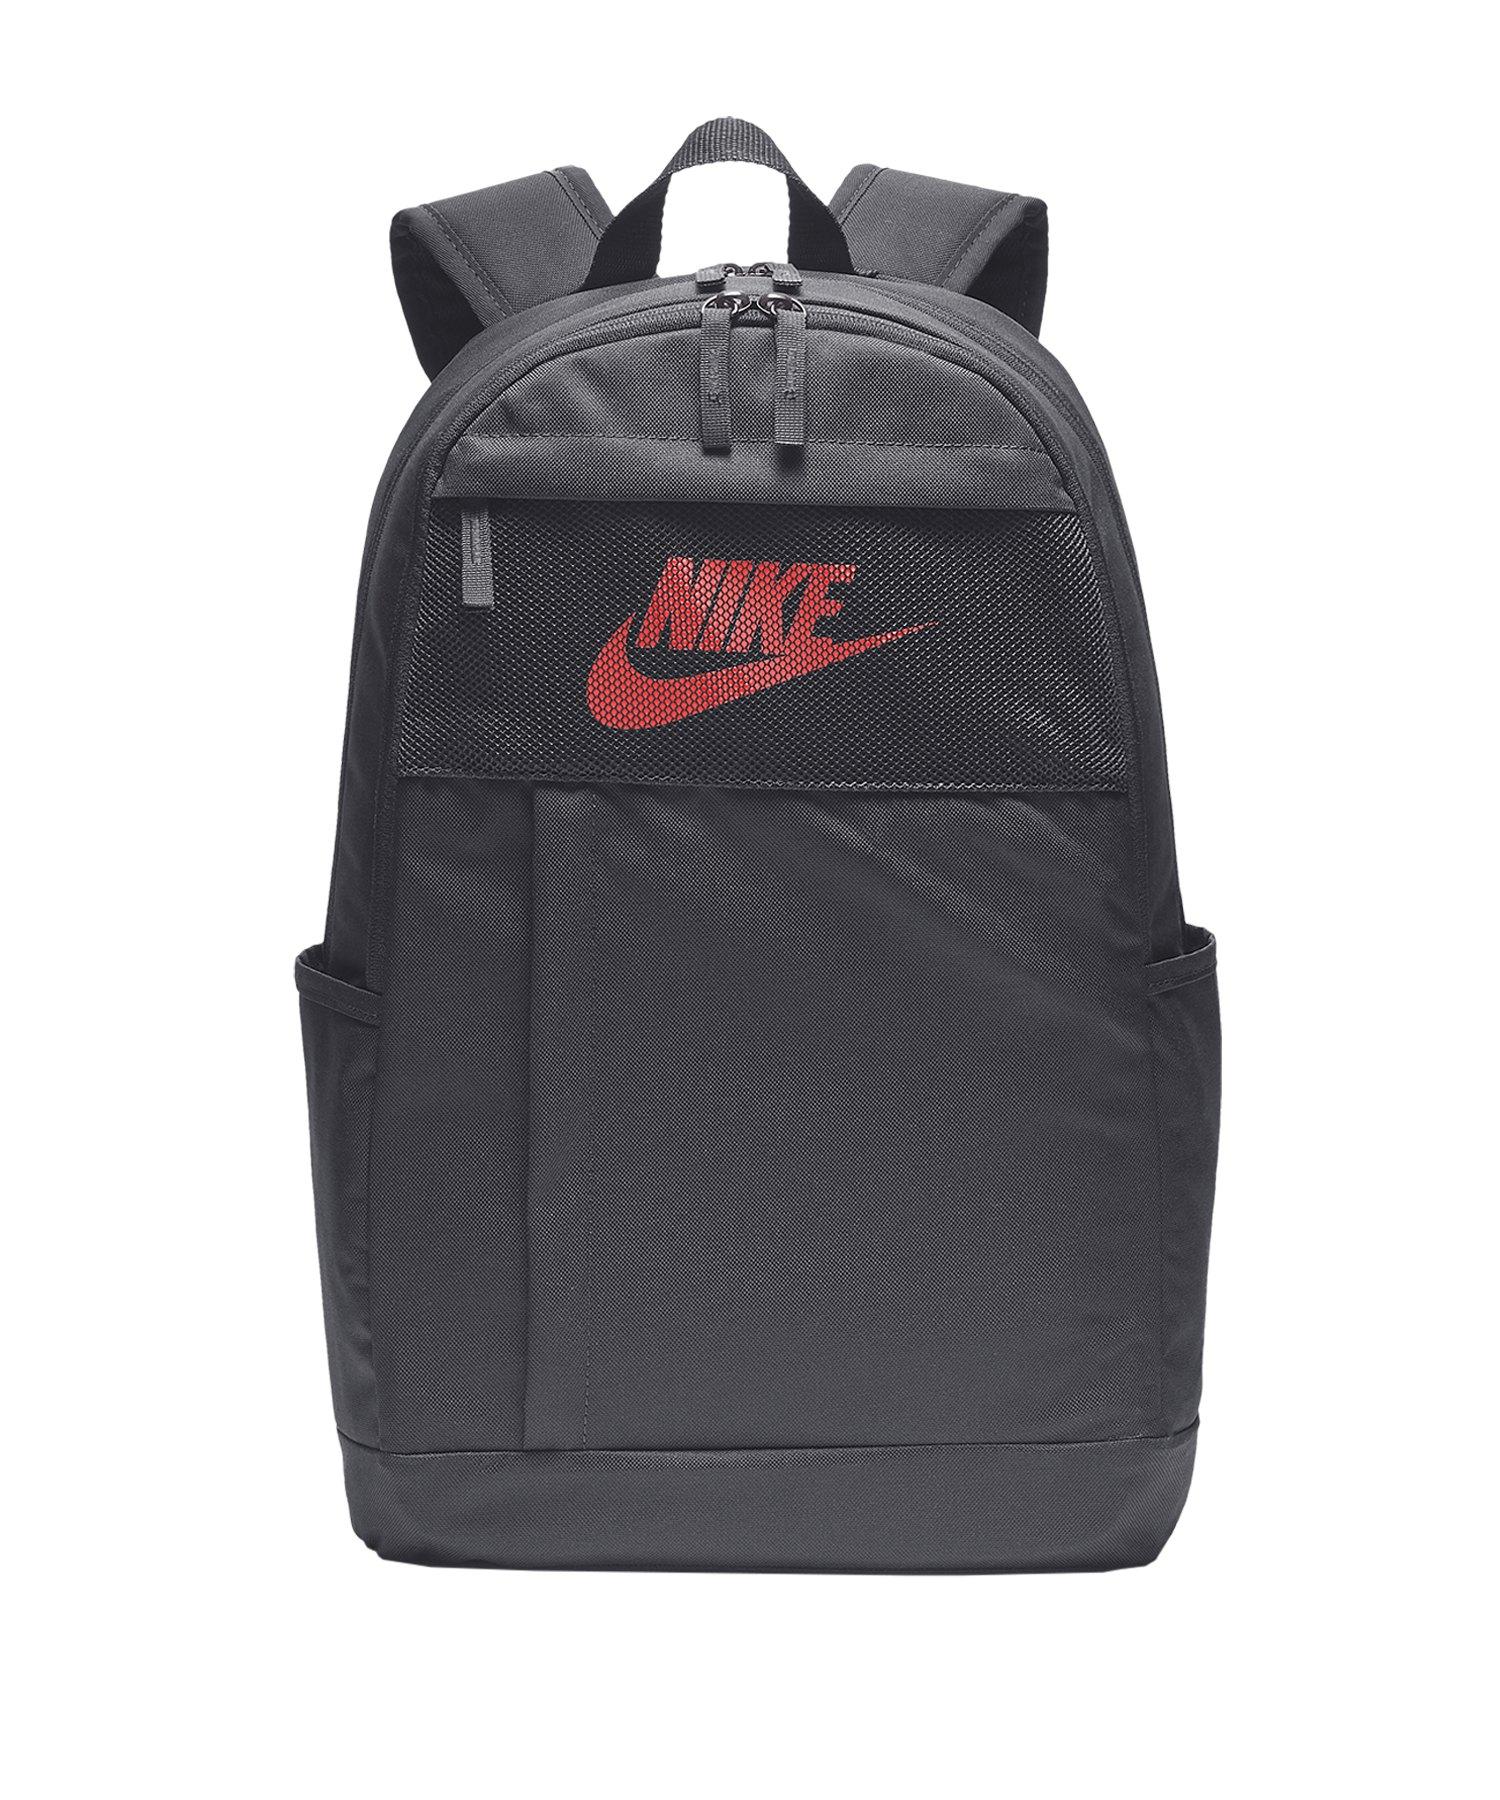 Nike Element 2.0 Rucksack Grau F070 - schwarz